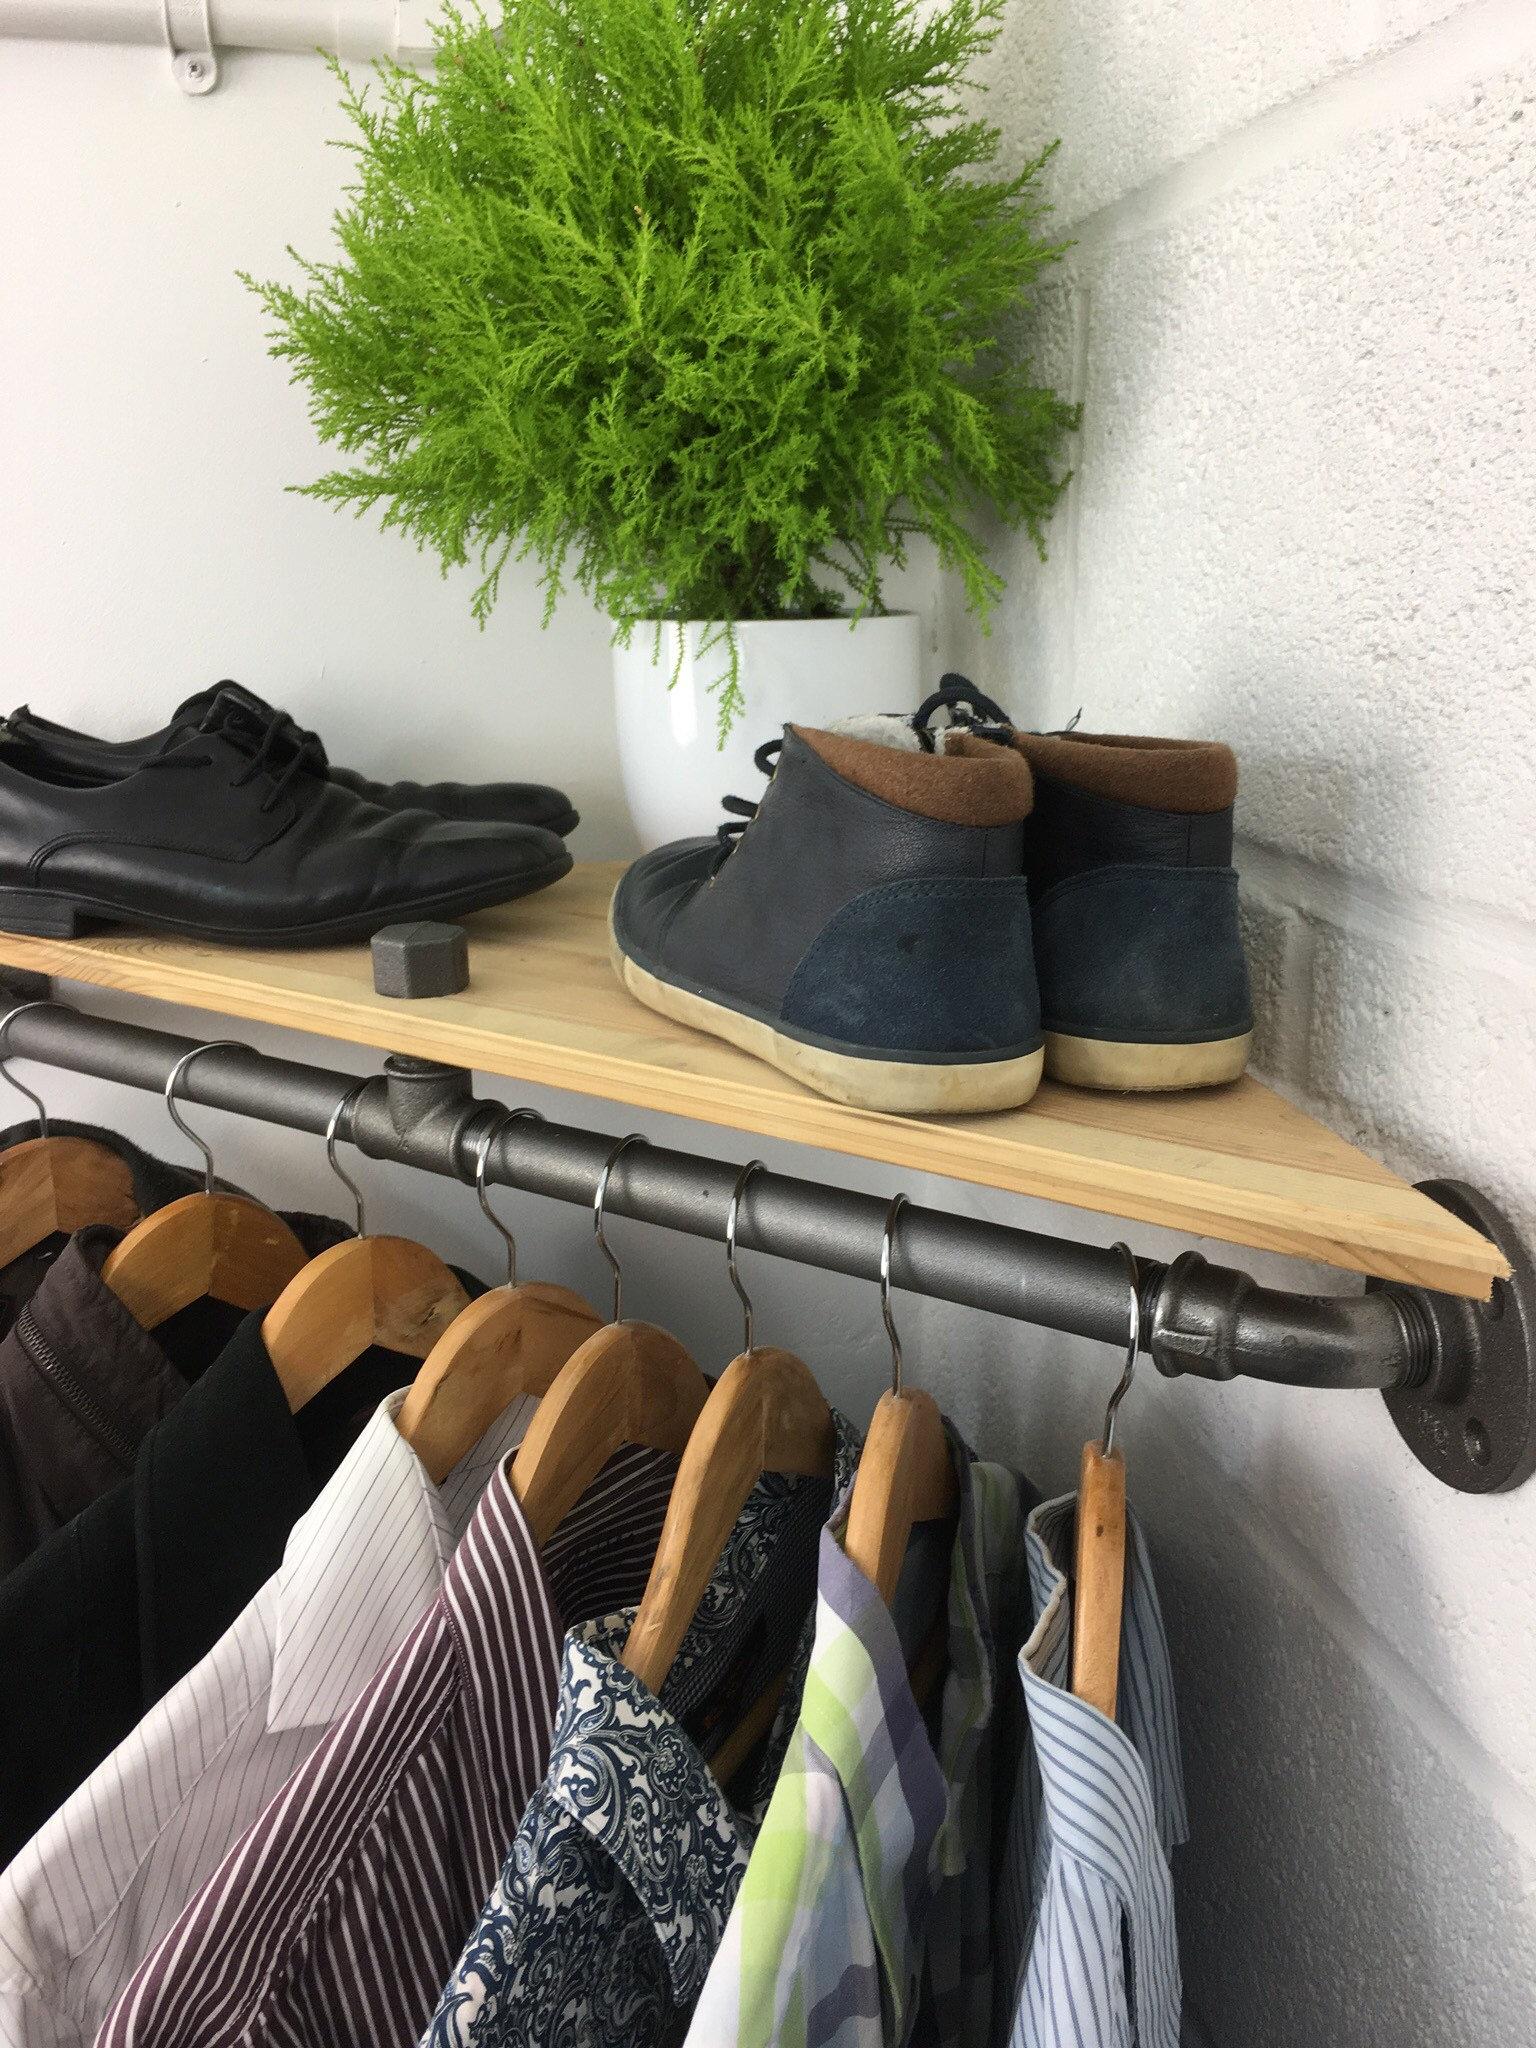 Handmade Urban Industrial Corner Shelf and Clothes Hanging Rail